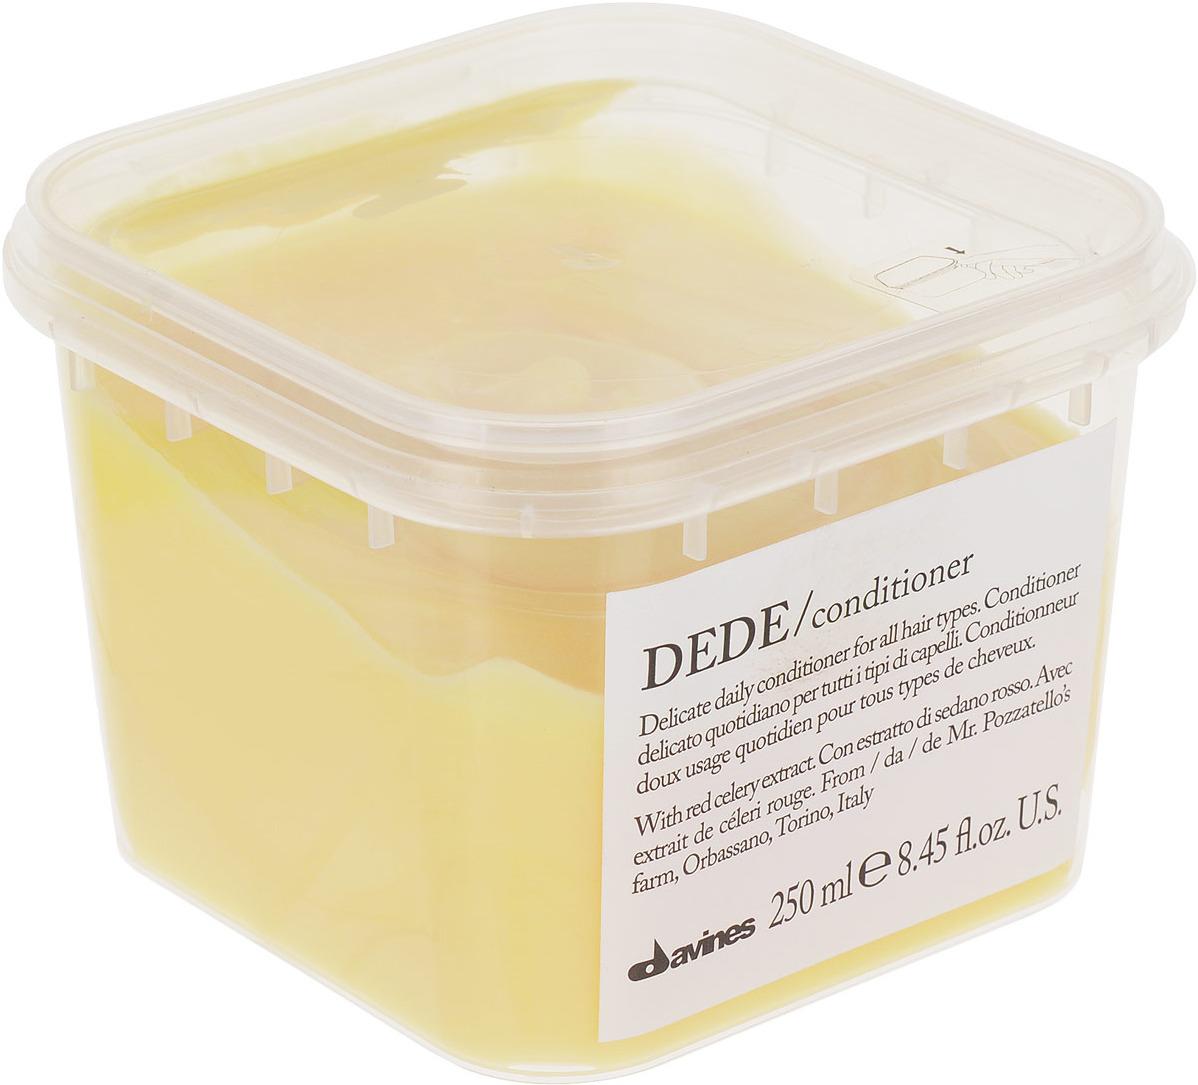 Davines Деликатный кондиционер Essential Haircare Dede Conditioner, 250 мл